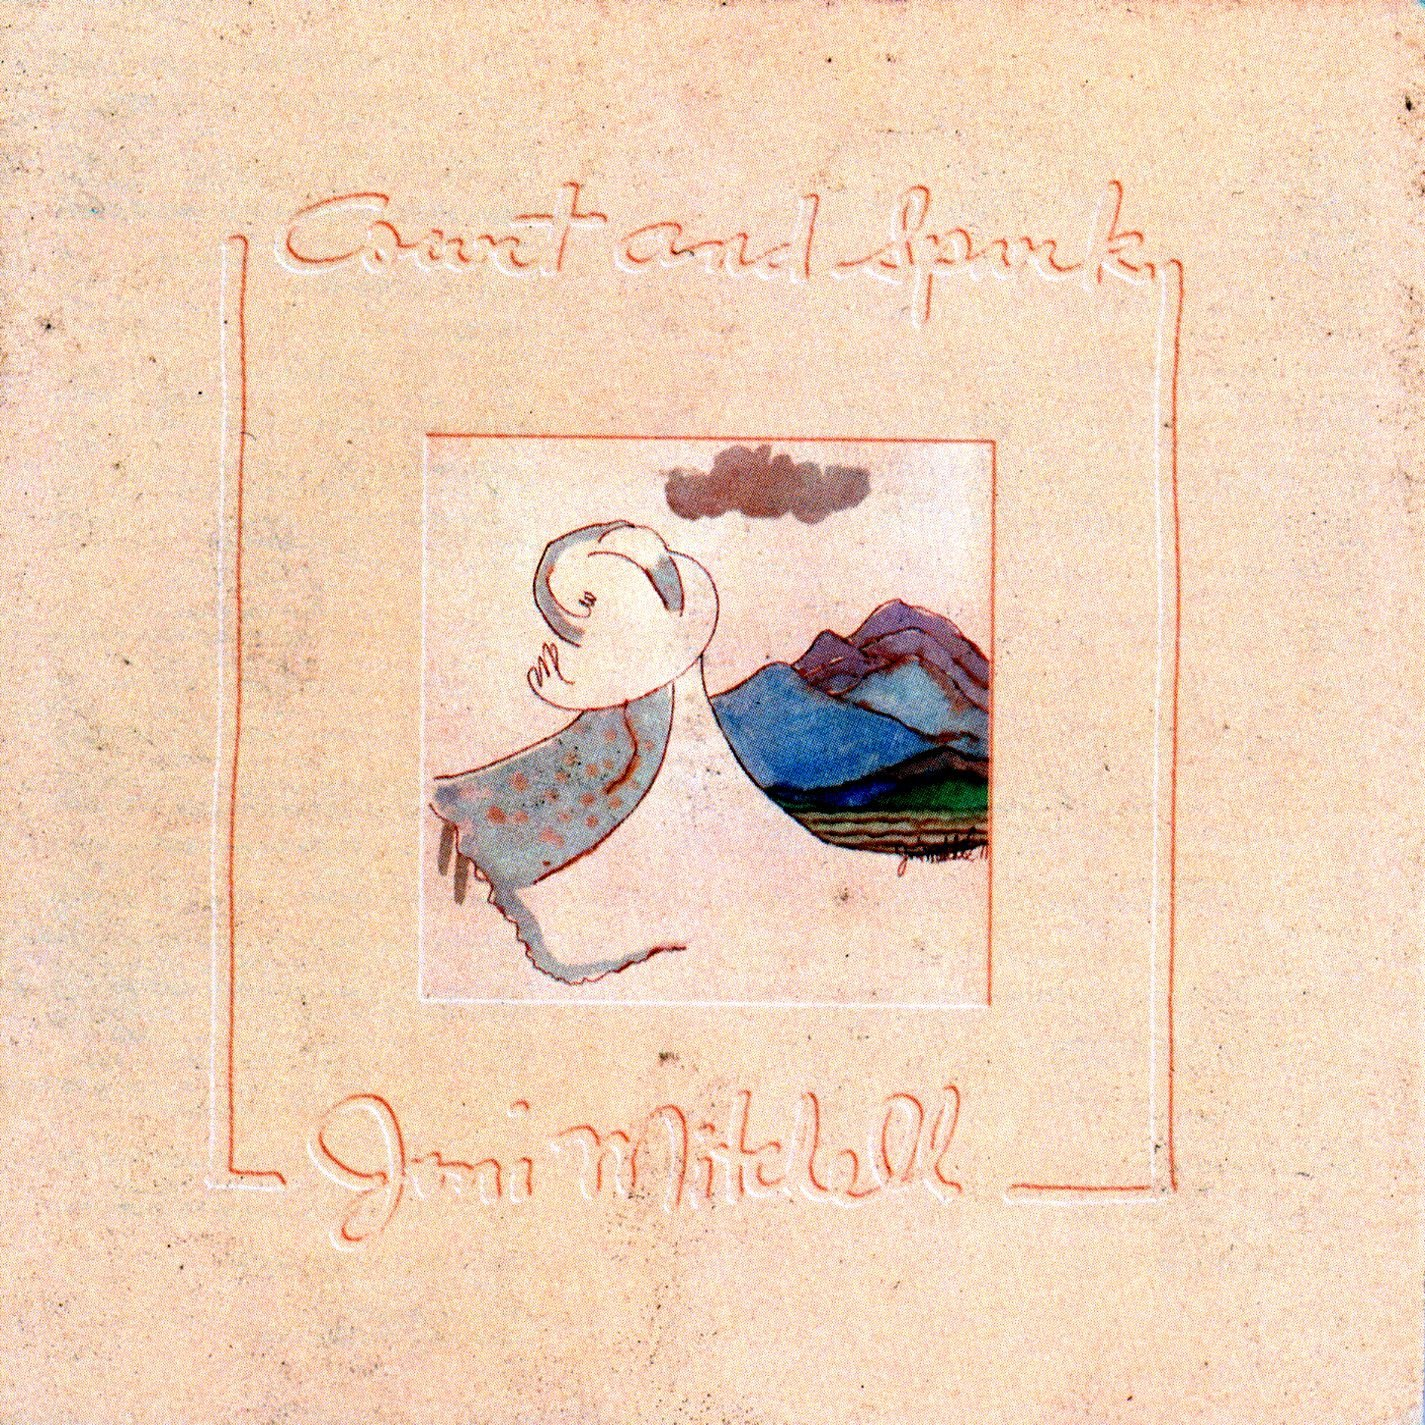 Joni Mitchell, Court and Spark